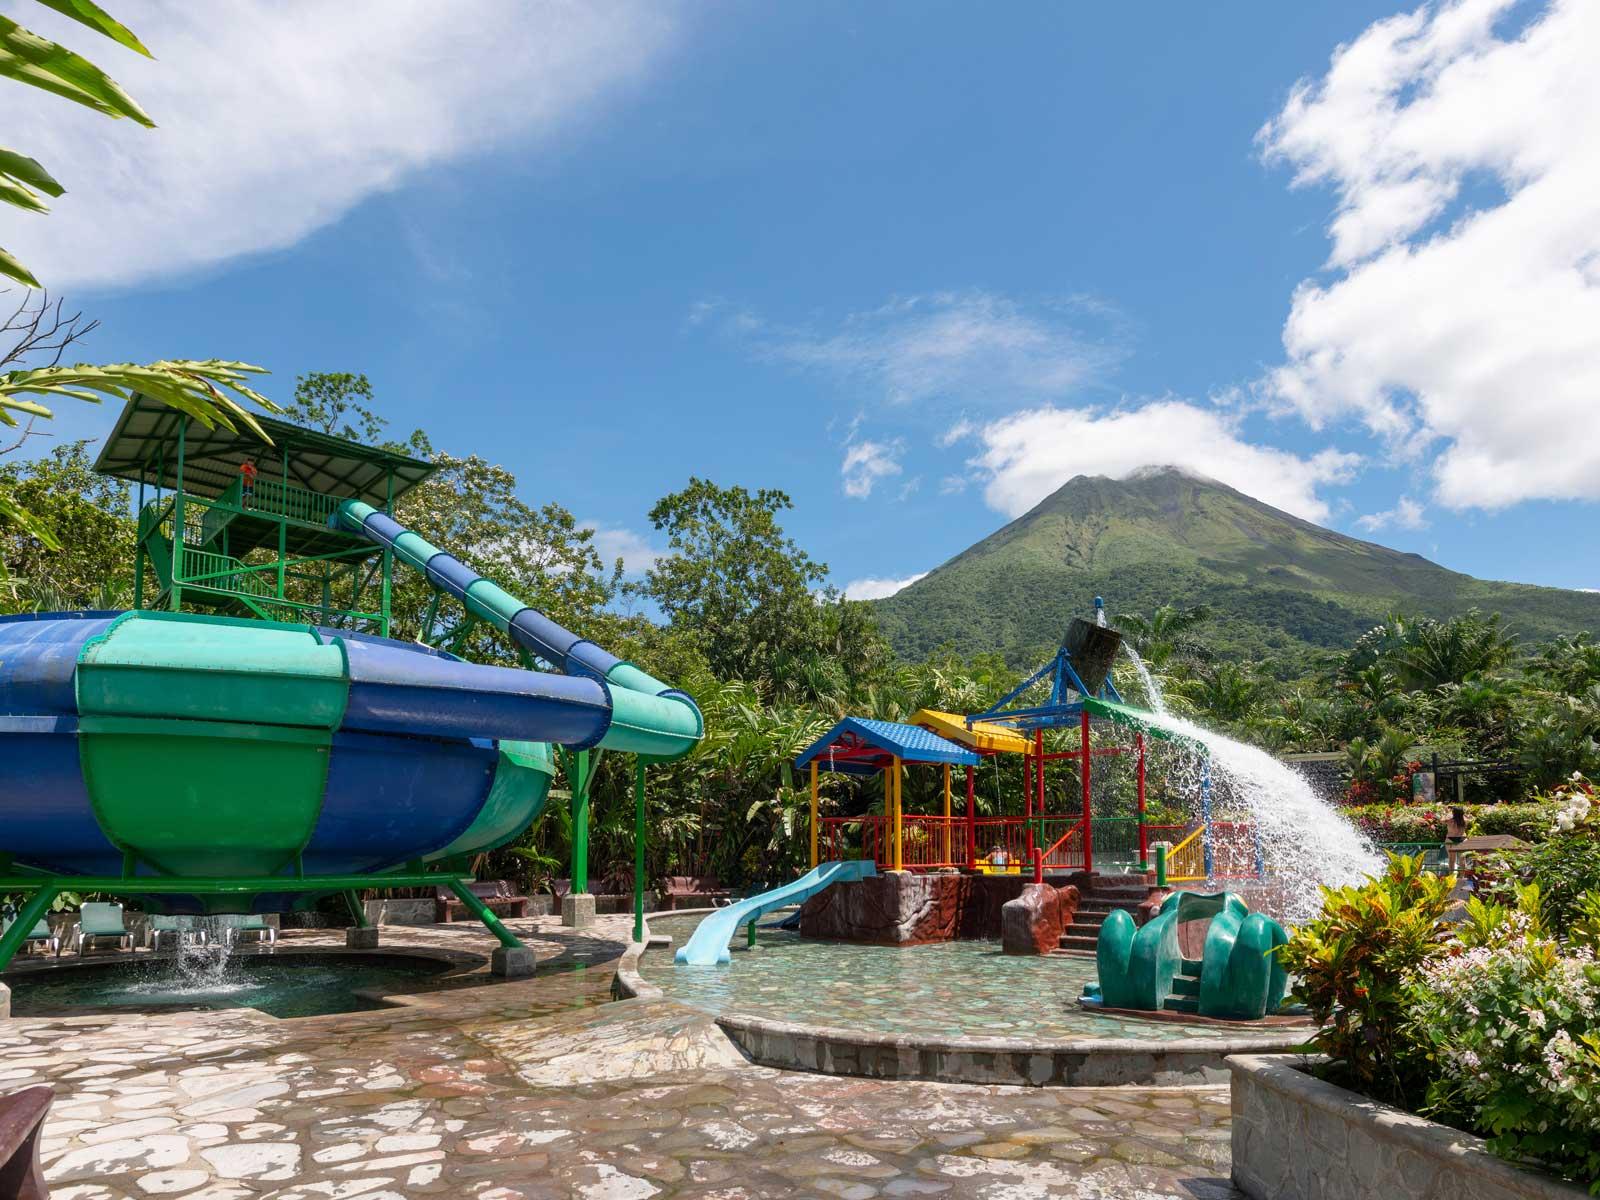 Arenal Volcano View at Baldi Hot Springs (6)